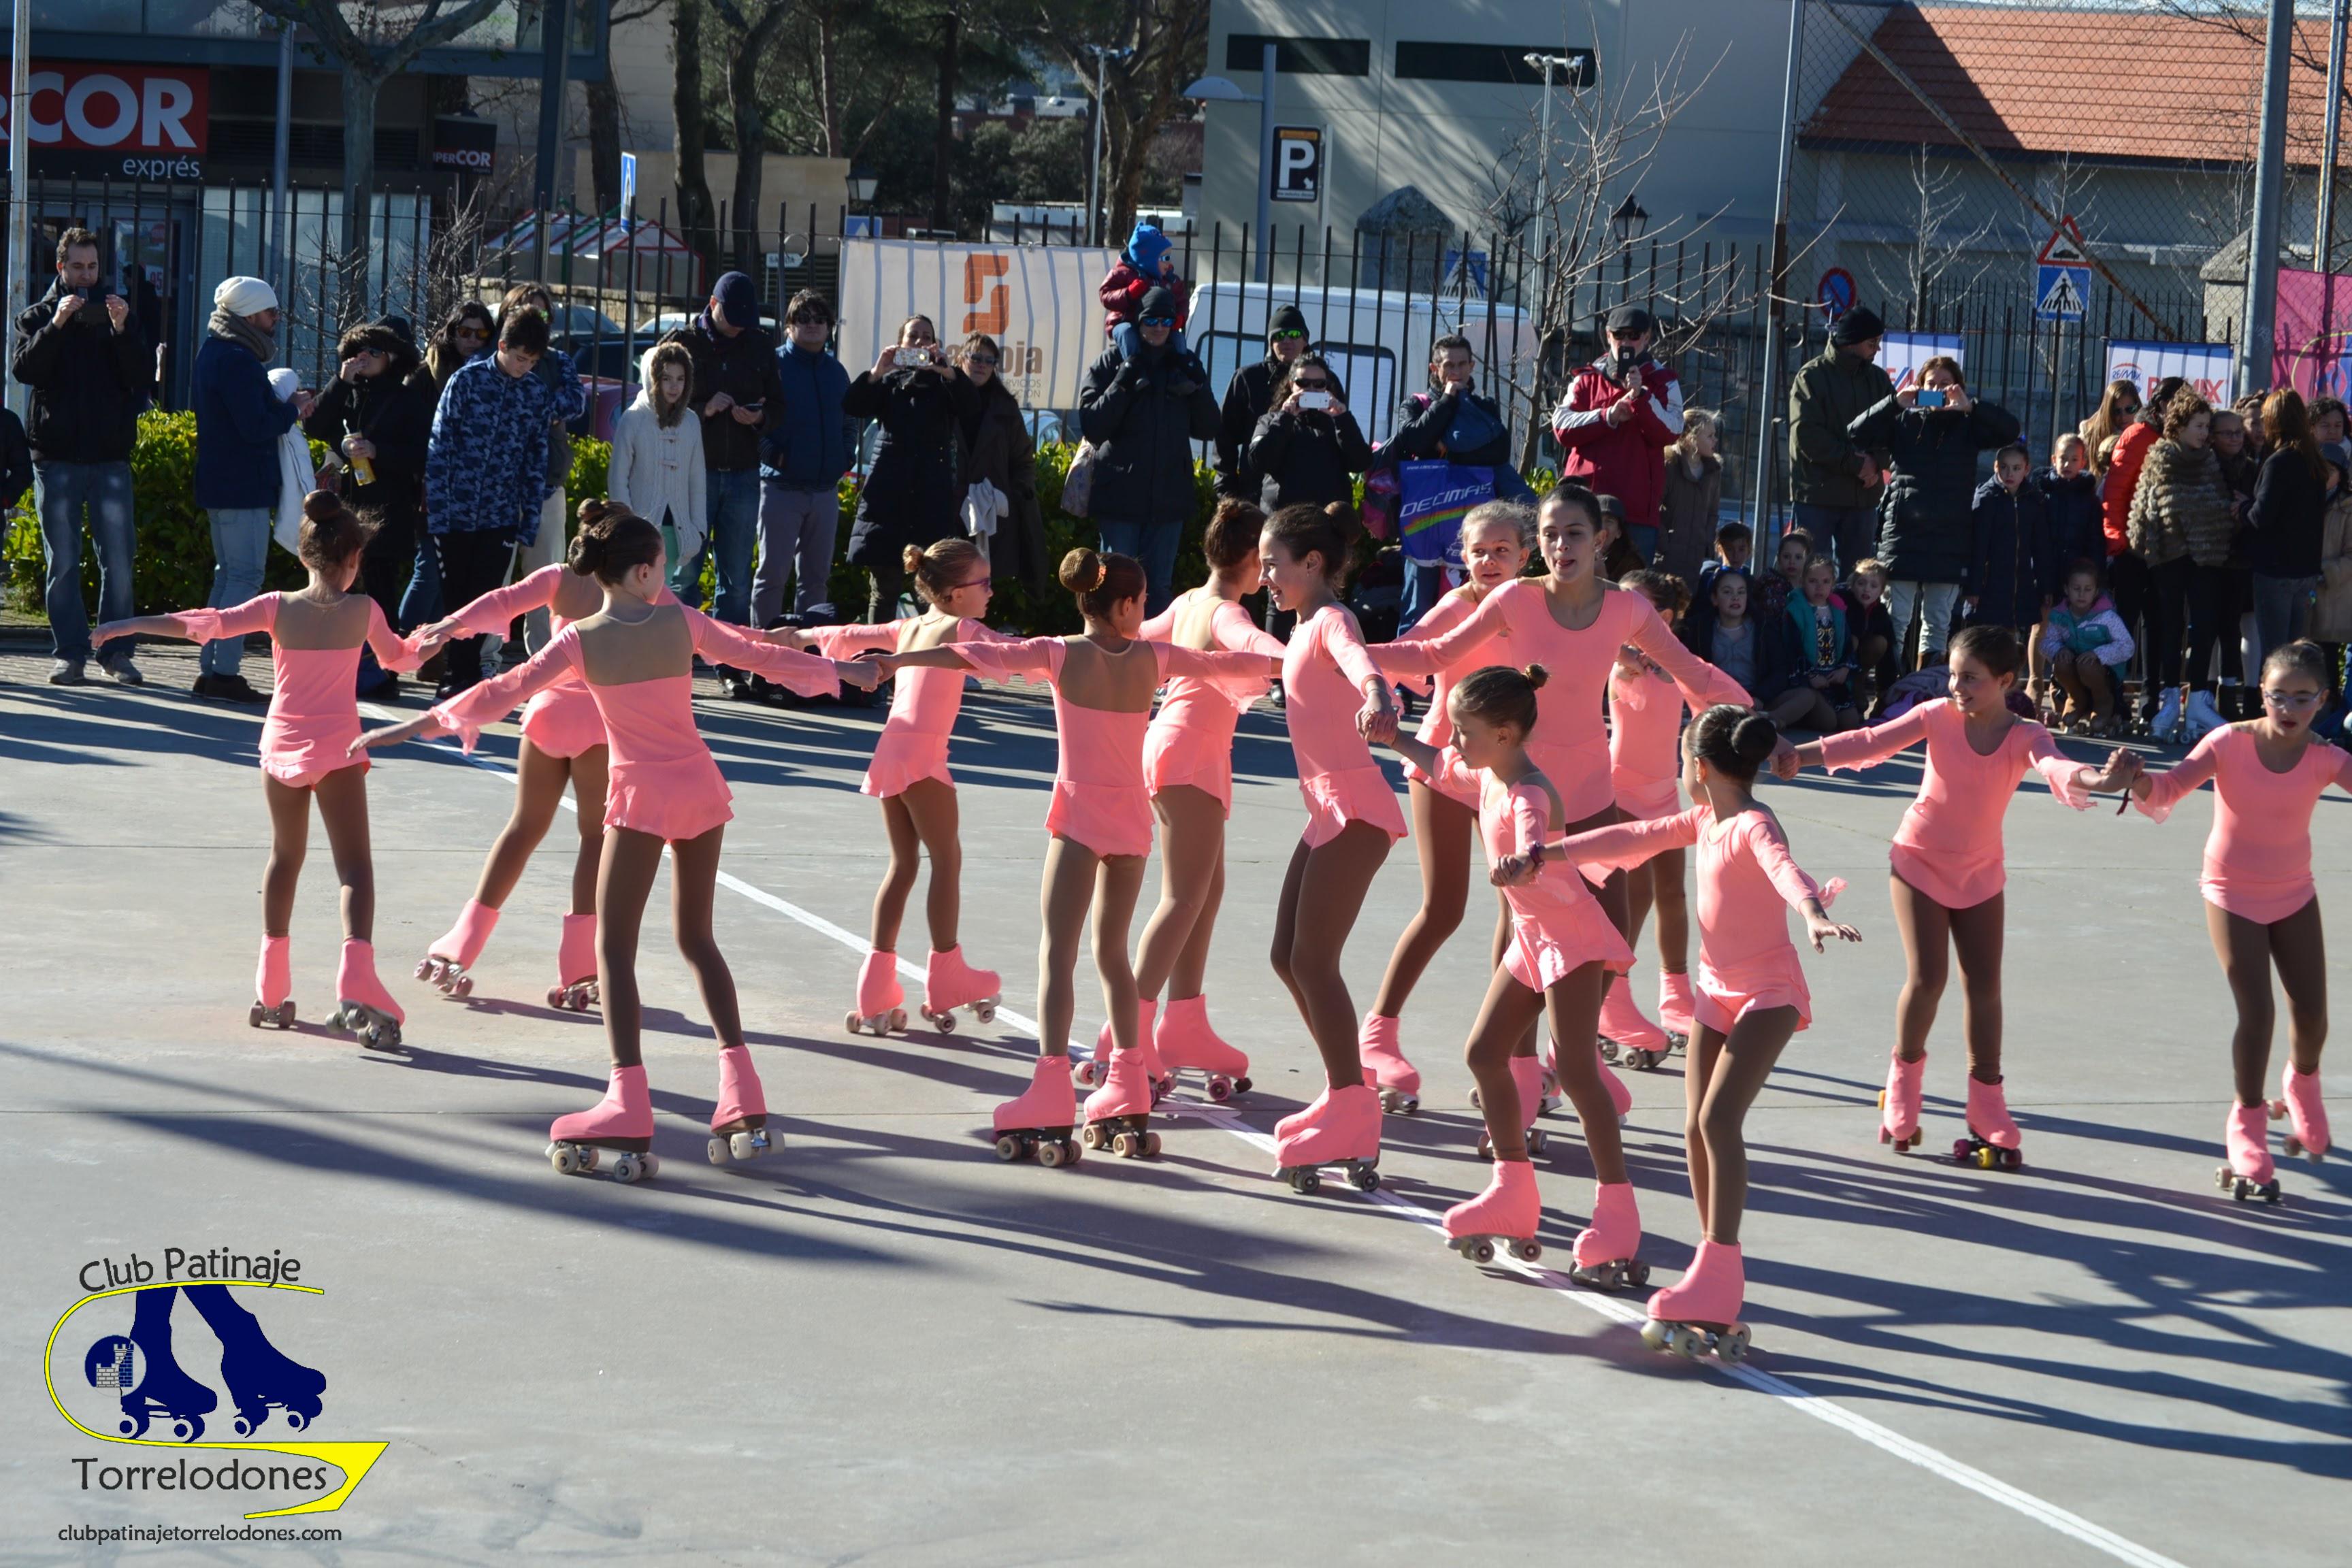 CLUB PATINAJE TORRELODONES21